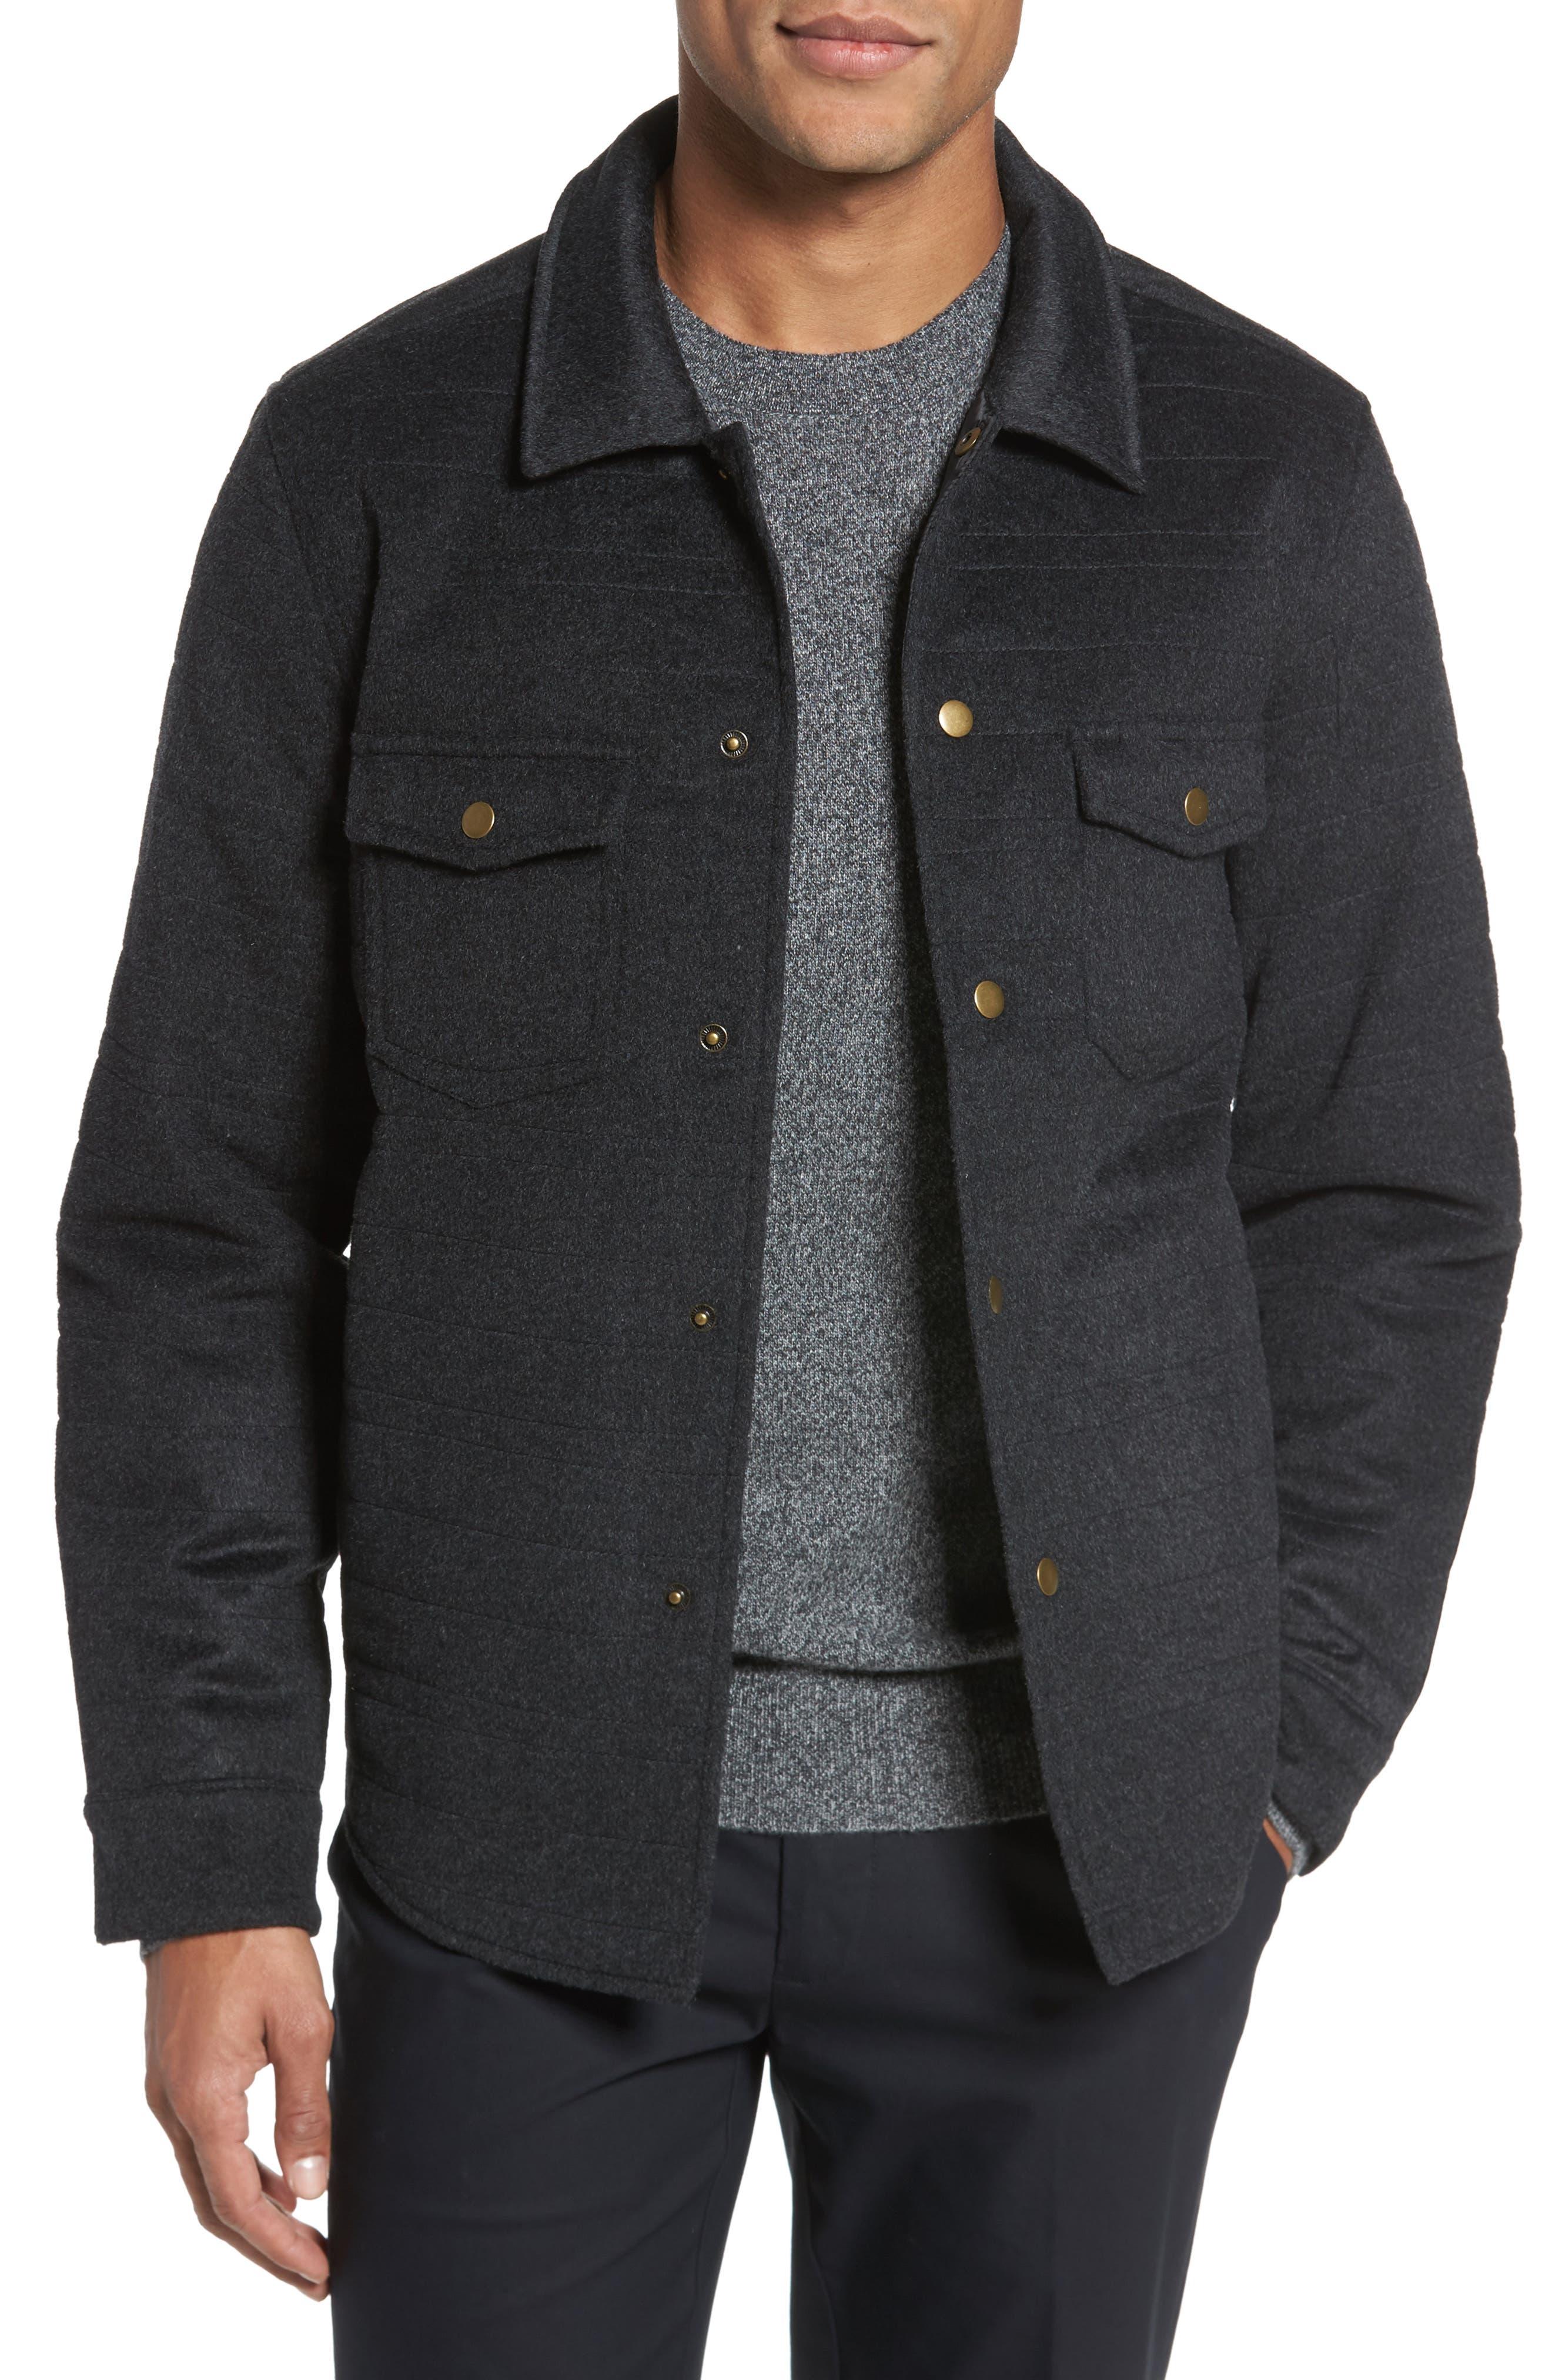 Michael Slim Fit Quilted Shirt Jacket,                             Main thumbnail 1, color,                             Dark Char Melange